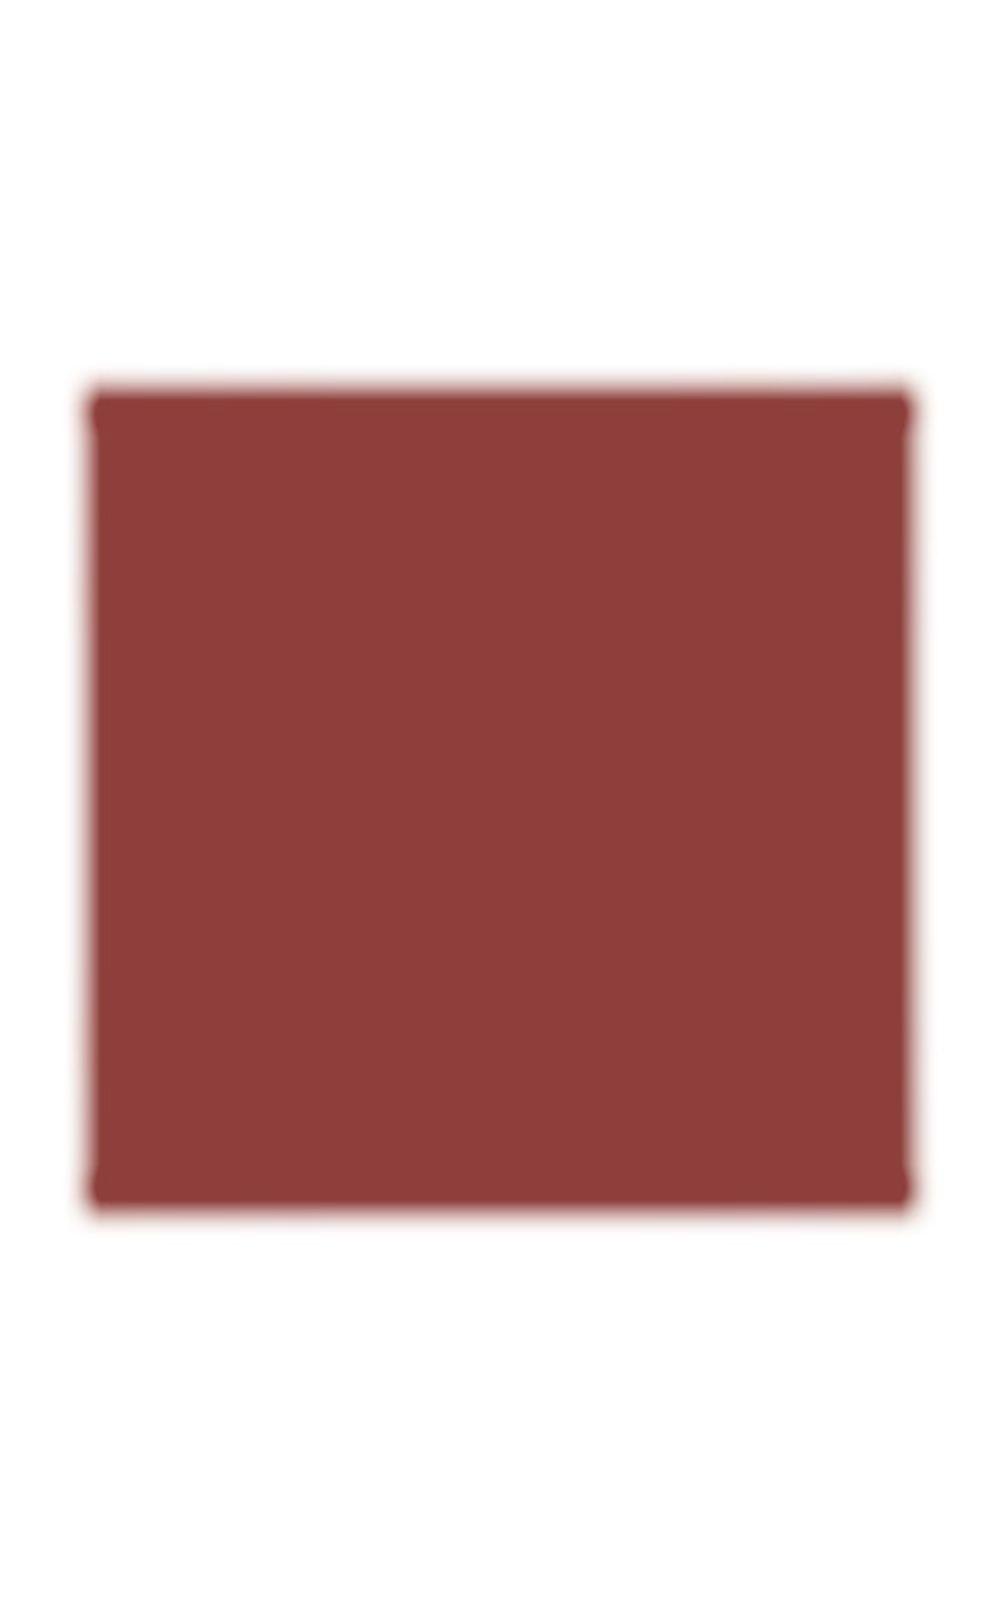 Foto 2 - Red Carpet Hot Makeup - Batom - RCL09 - Dim the Light